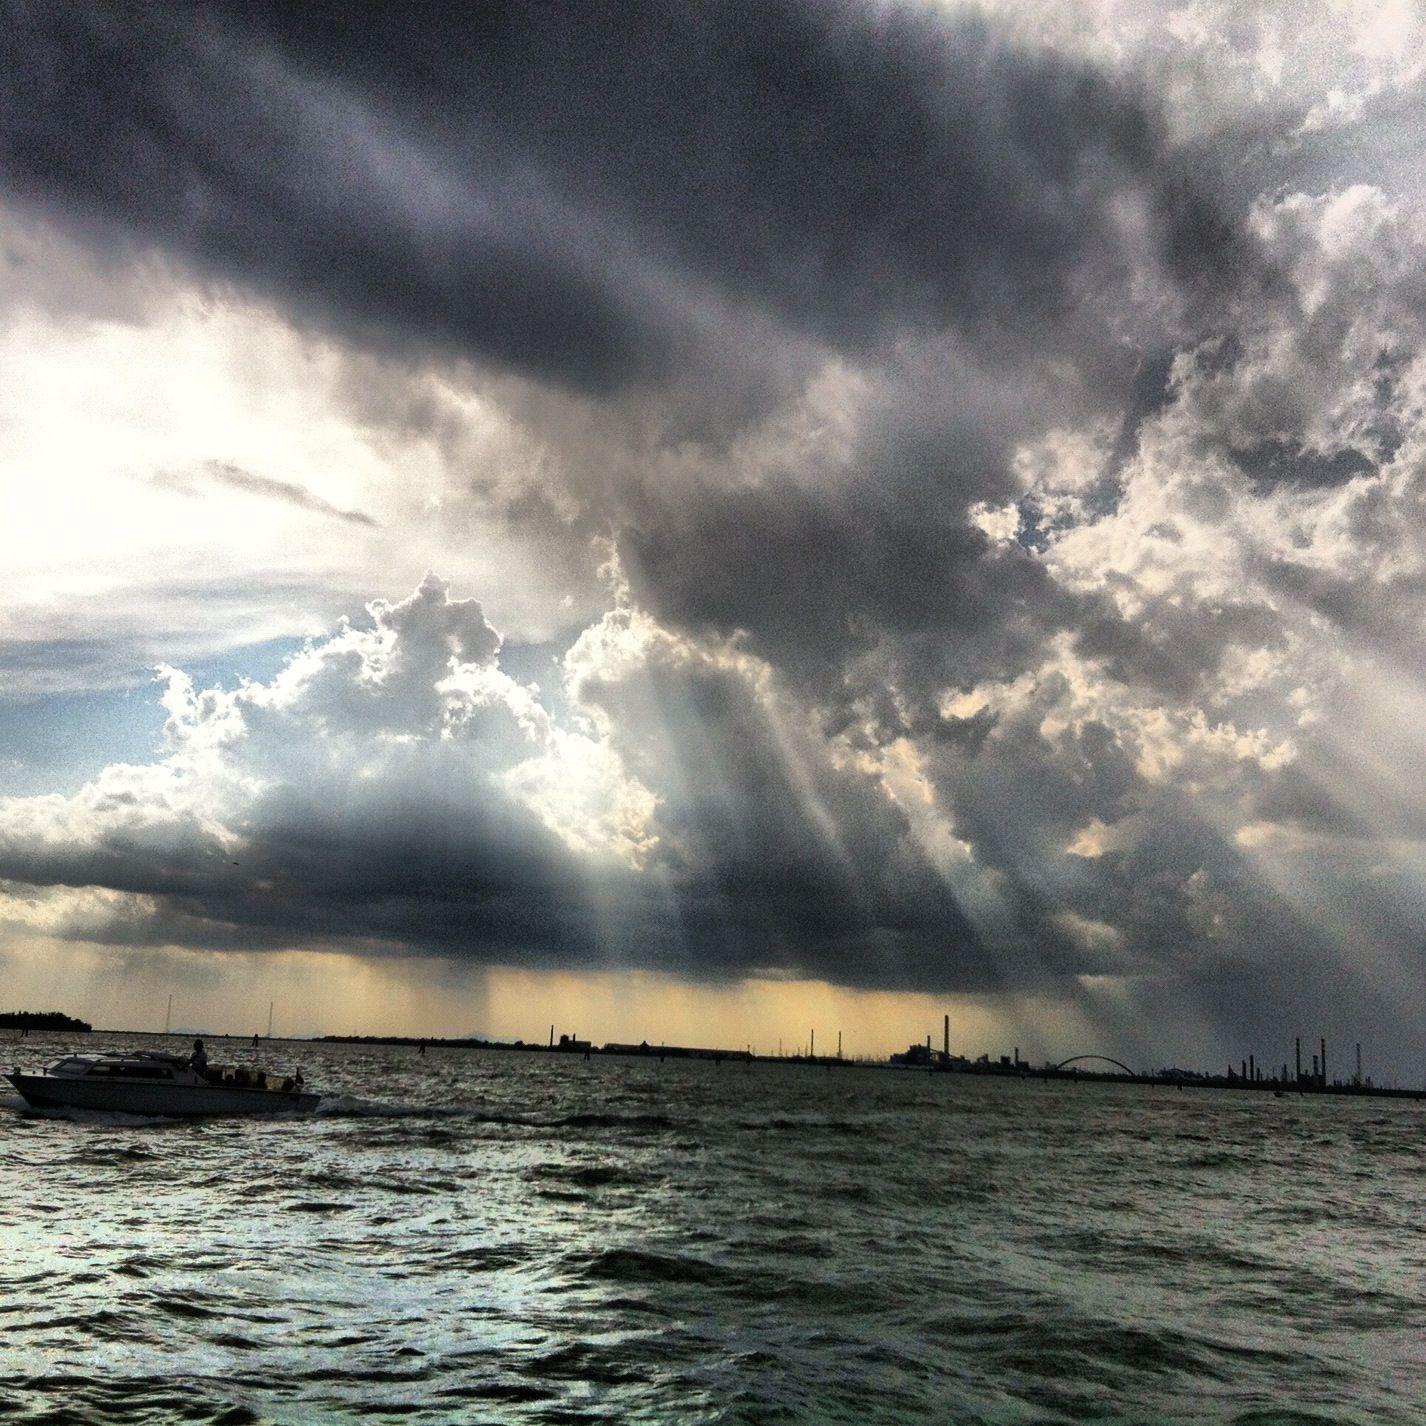 Sunbeams breaking through the dark clouds in Venice.